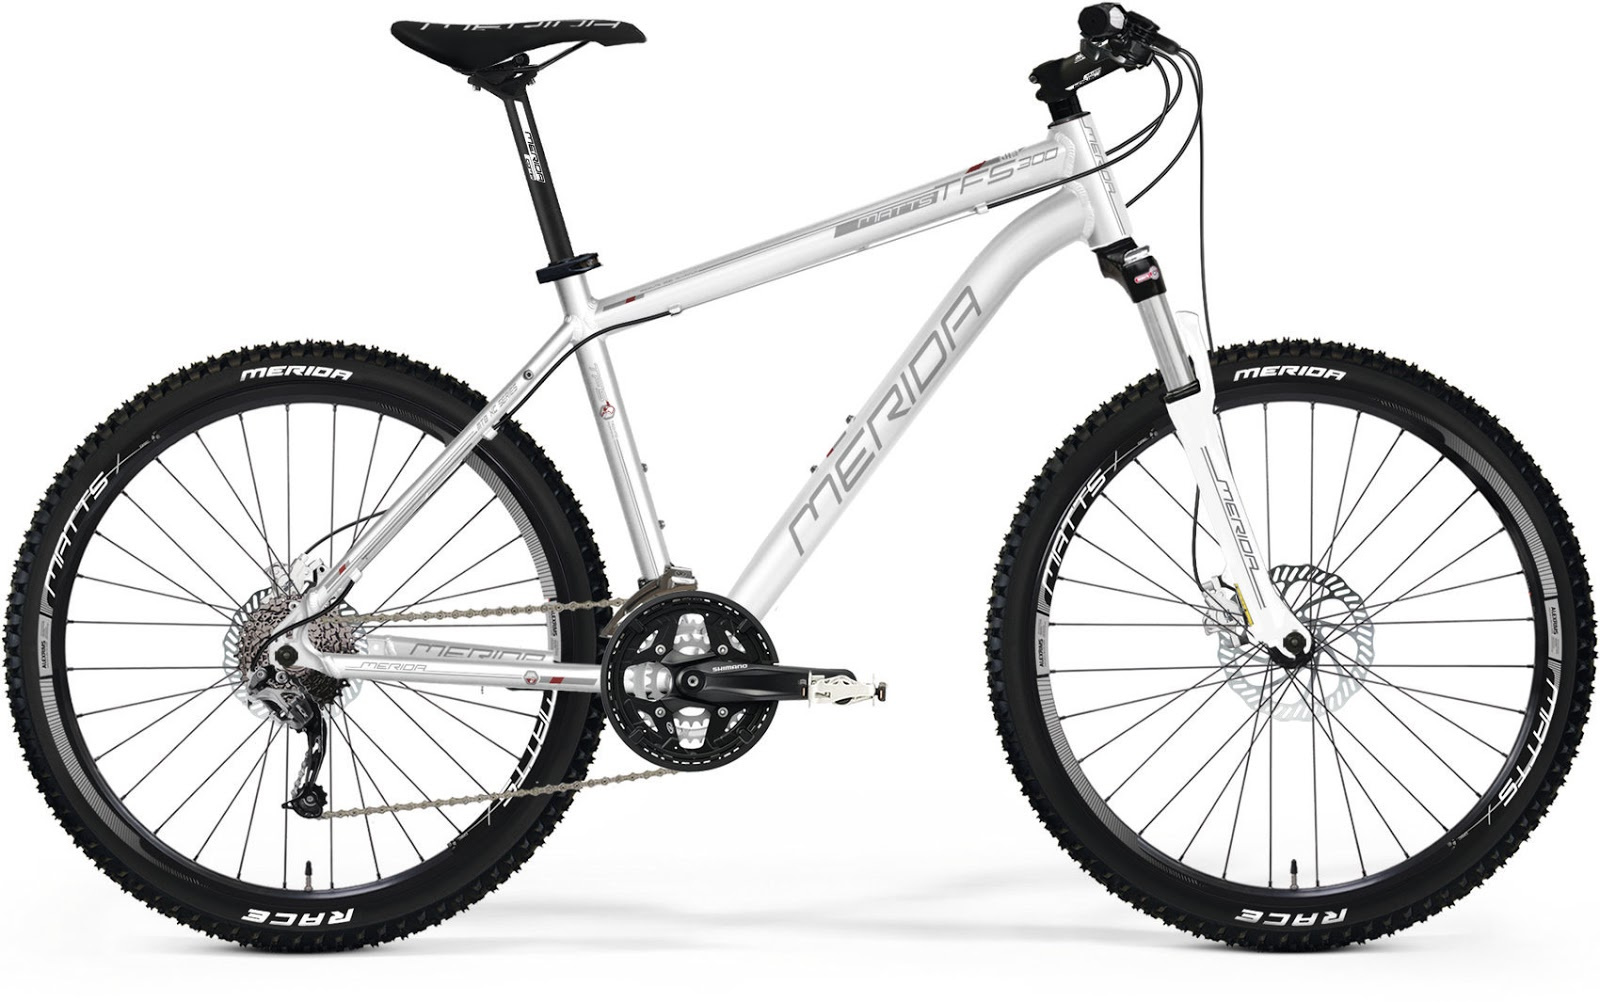 CHOO HO LEONG (CHL) Bicycle: Merida Mountain Bikes 2013